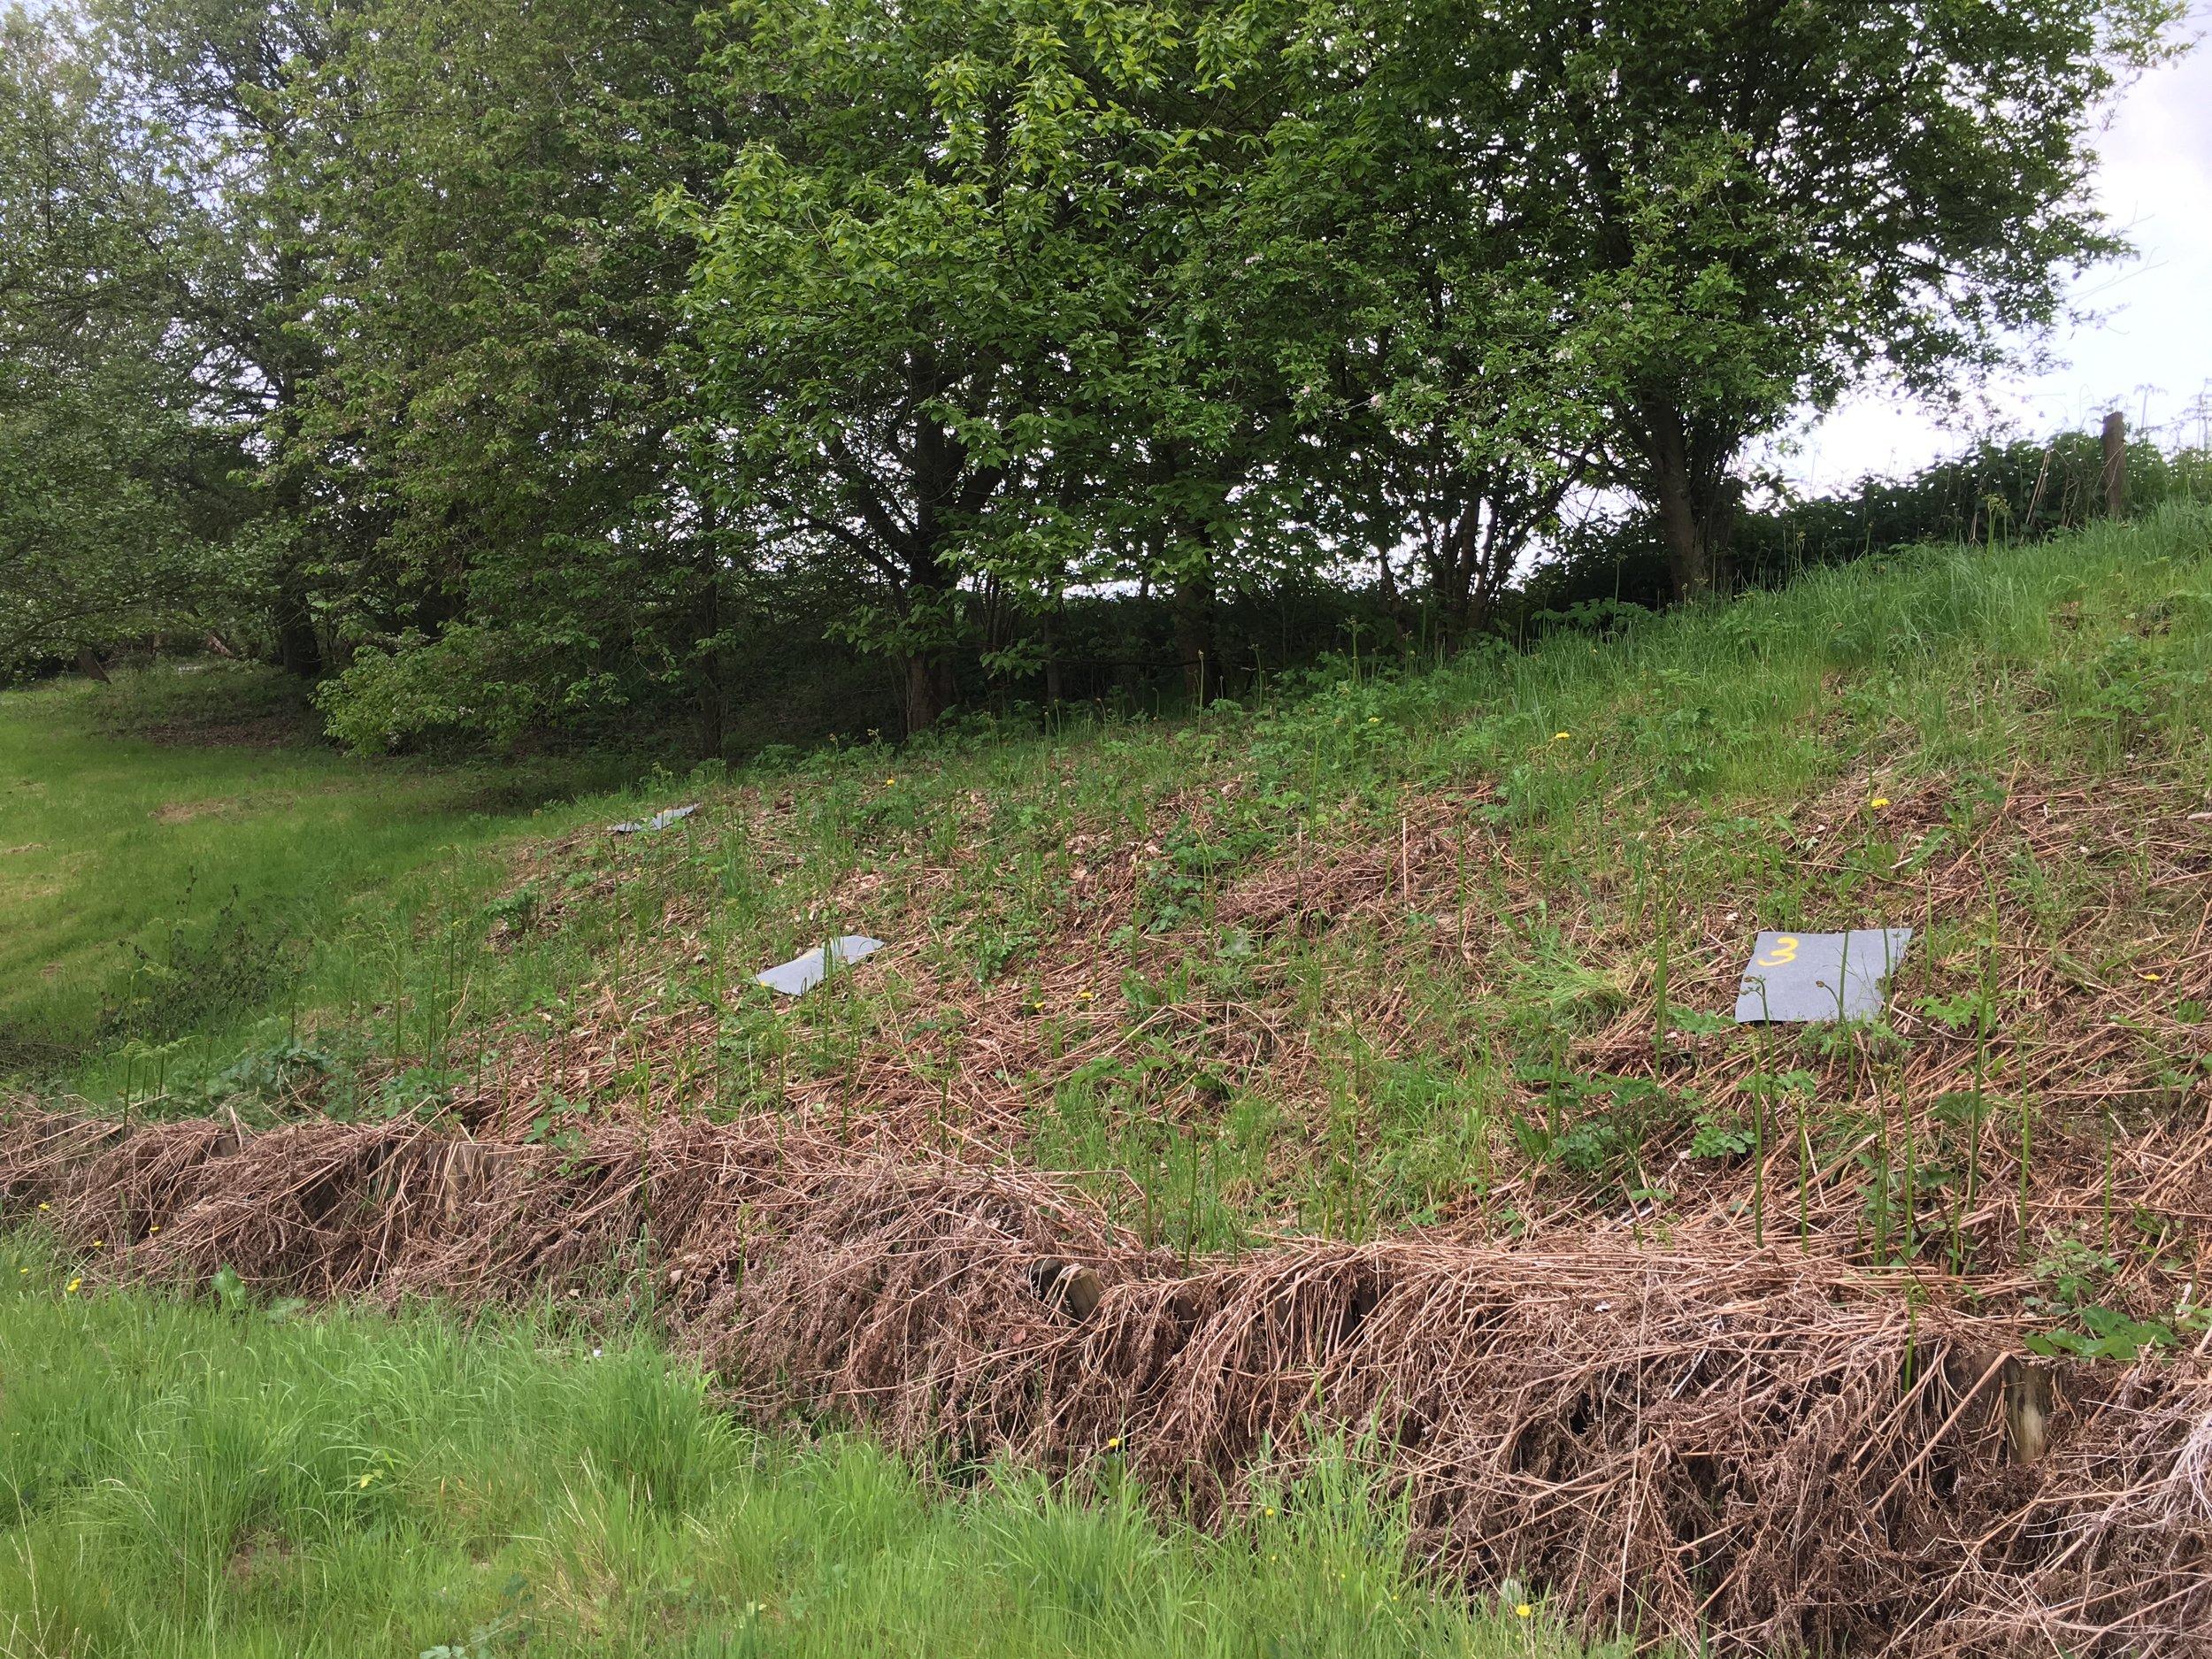 Reptile survey in Shropshire